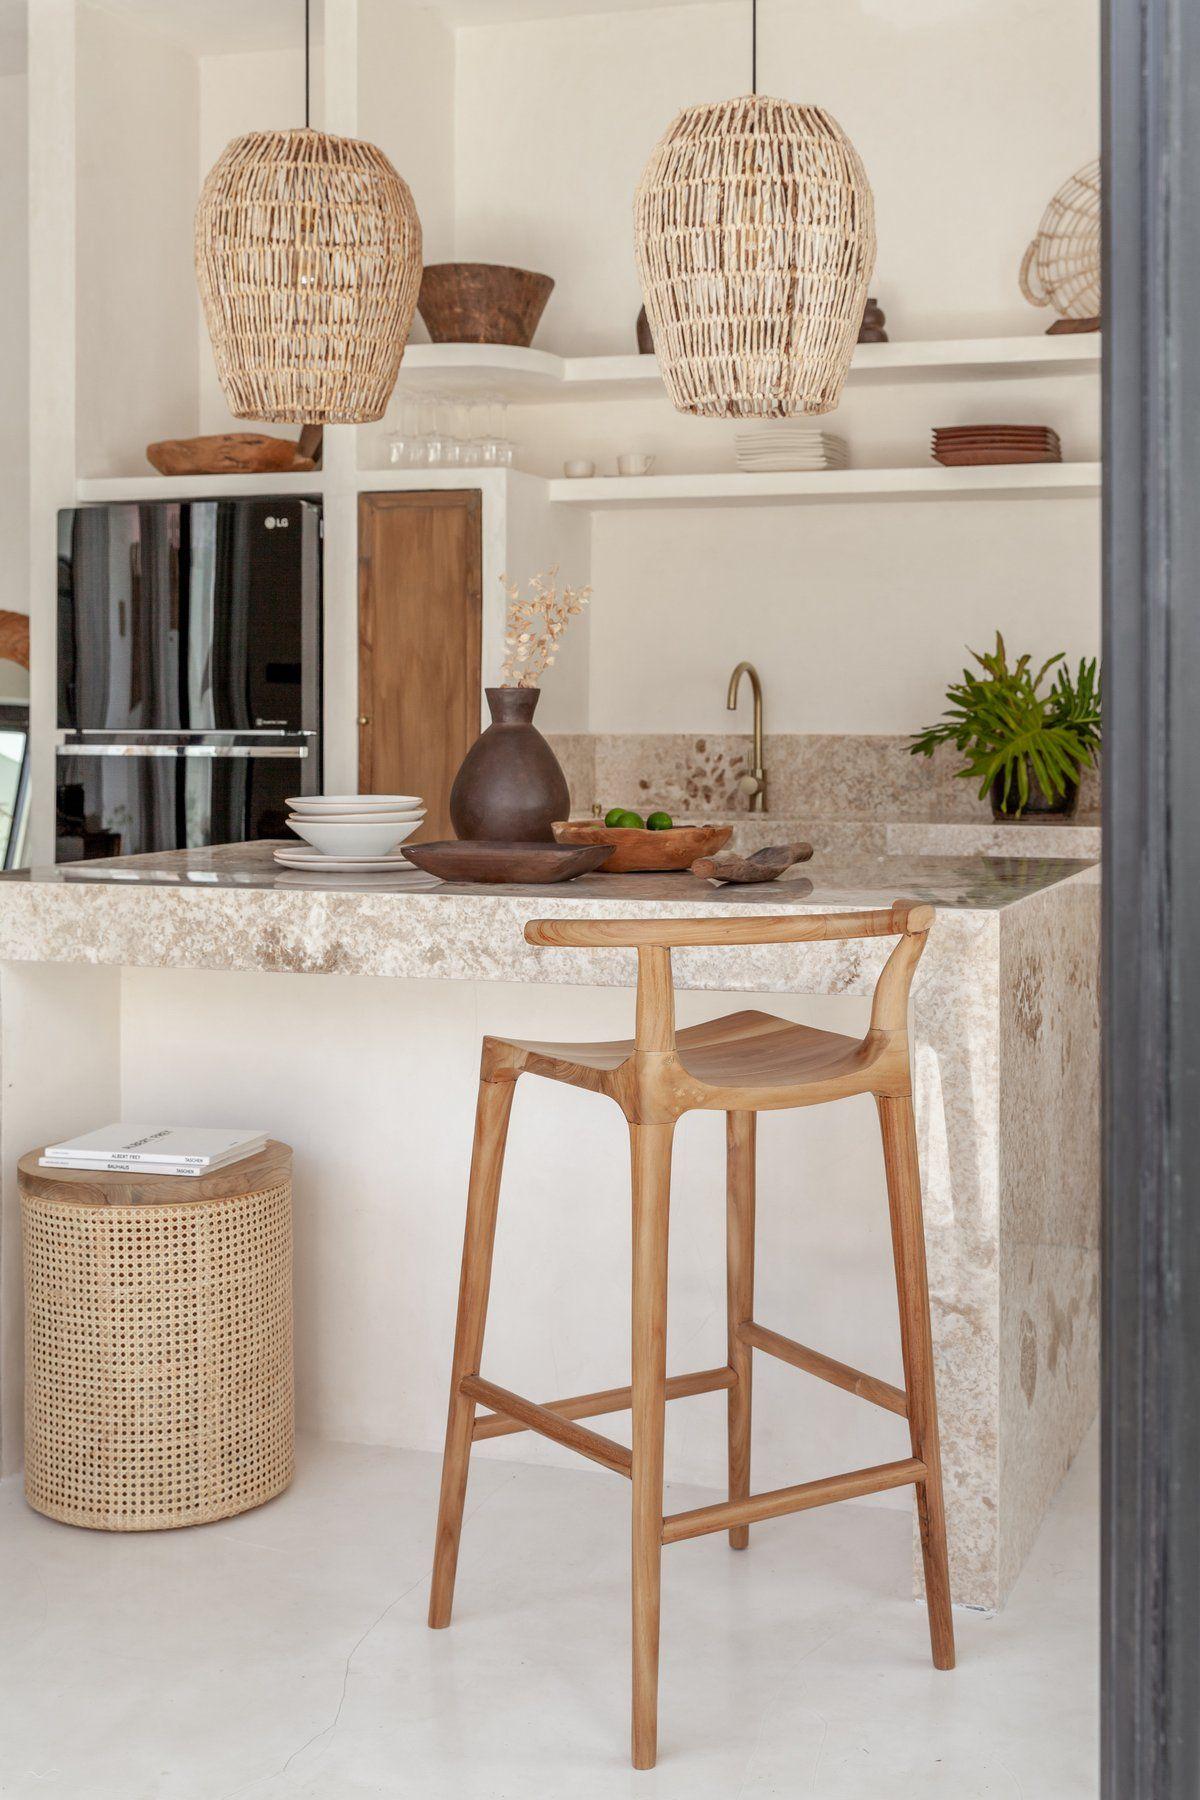 sadia - stool25